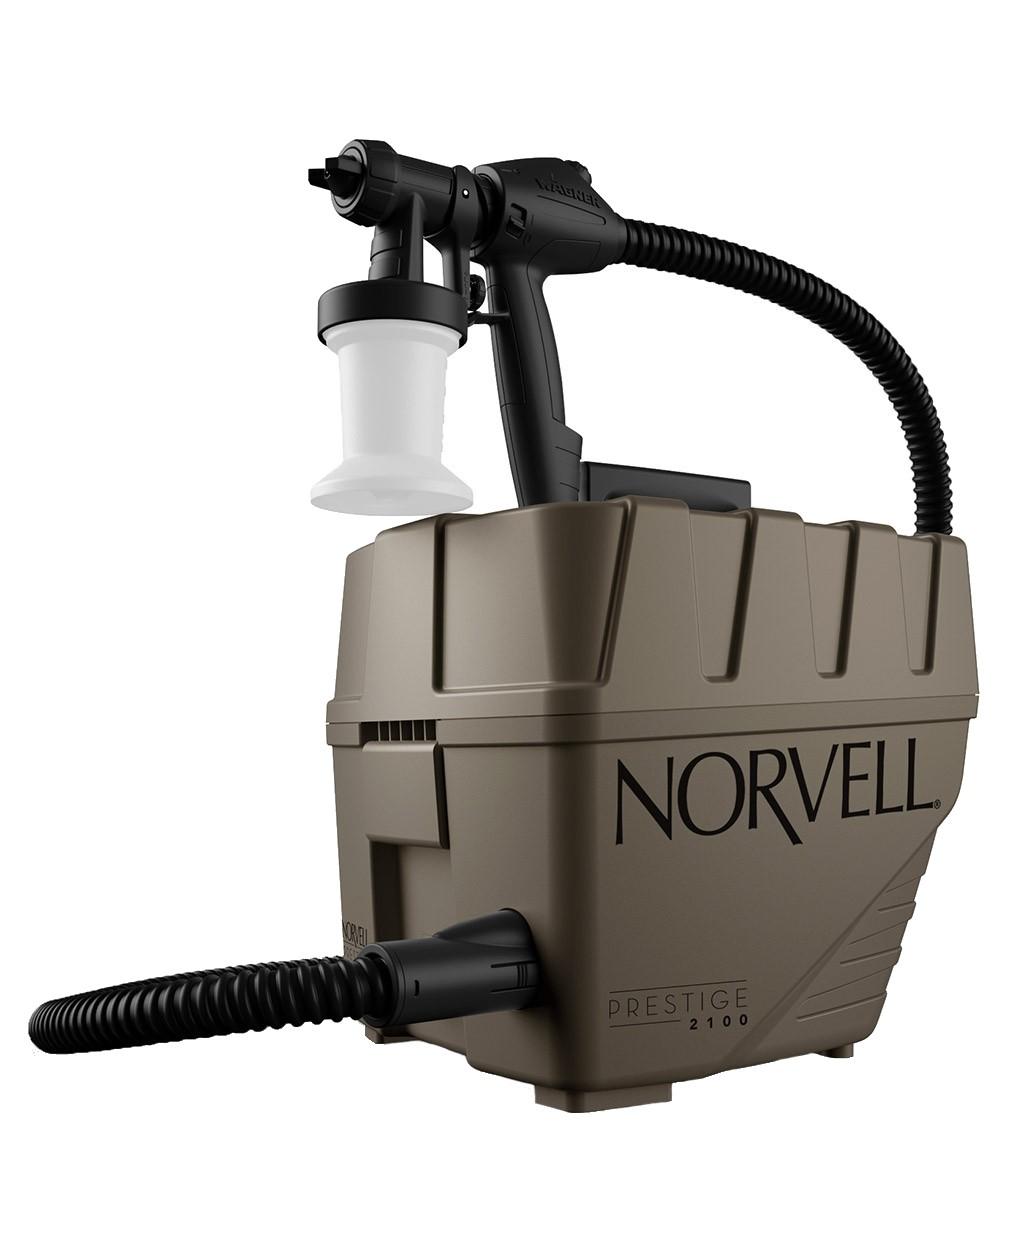 Norvell Sunless Prestige 2100 Pro Series HVLP Spray System